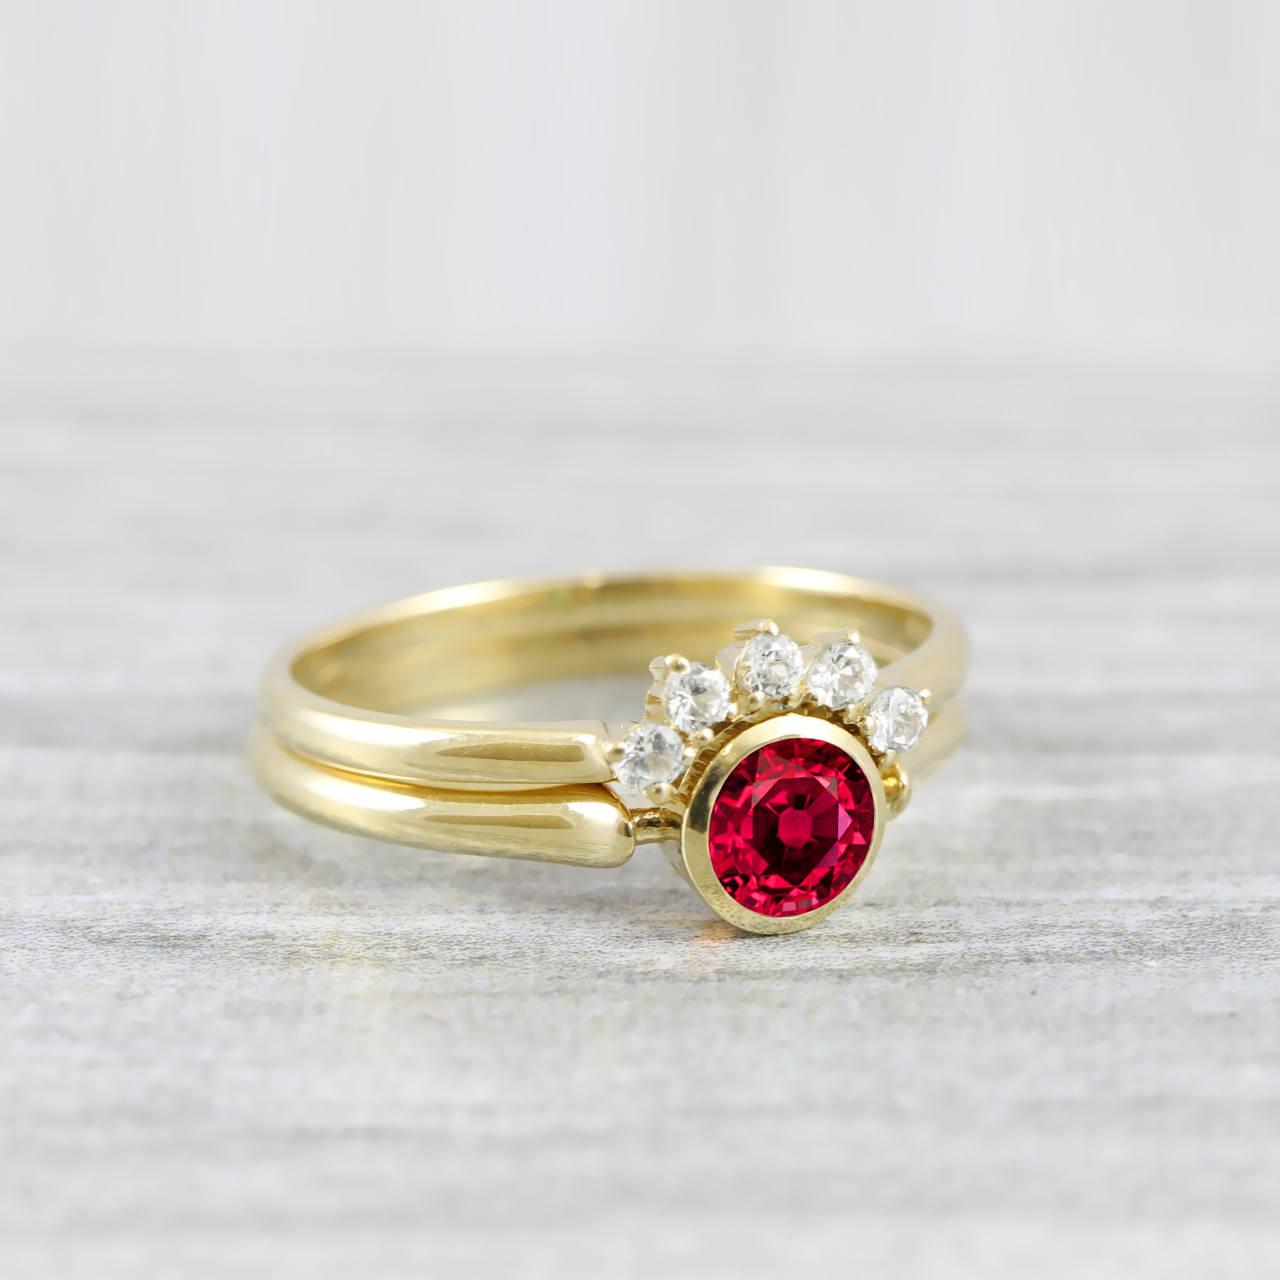 Ruby And Diamond Engagement Wedding Ring Set Handmade In Rose White